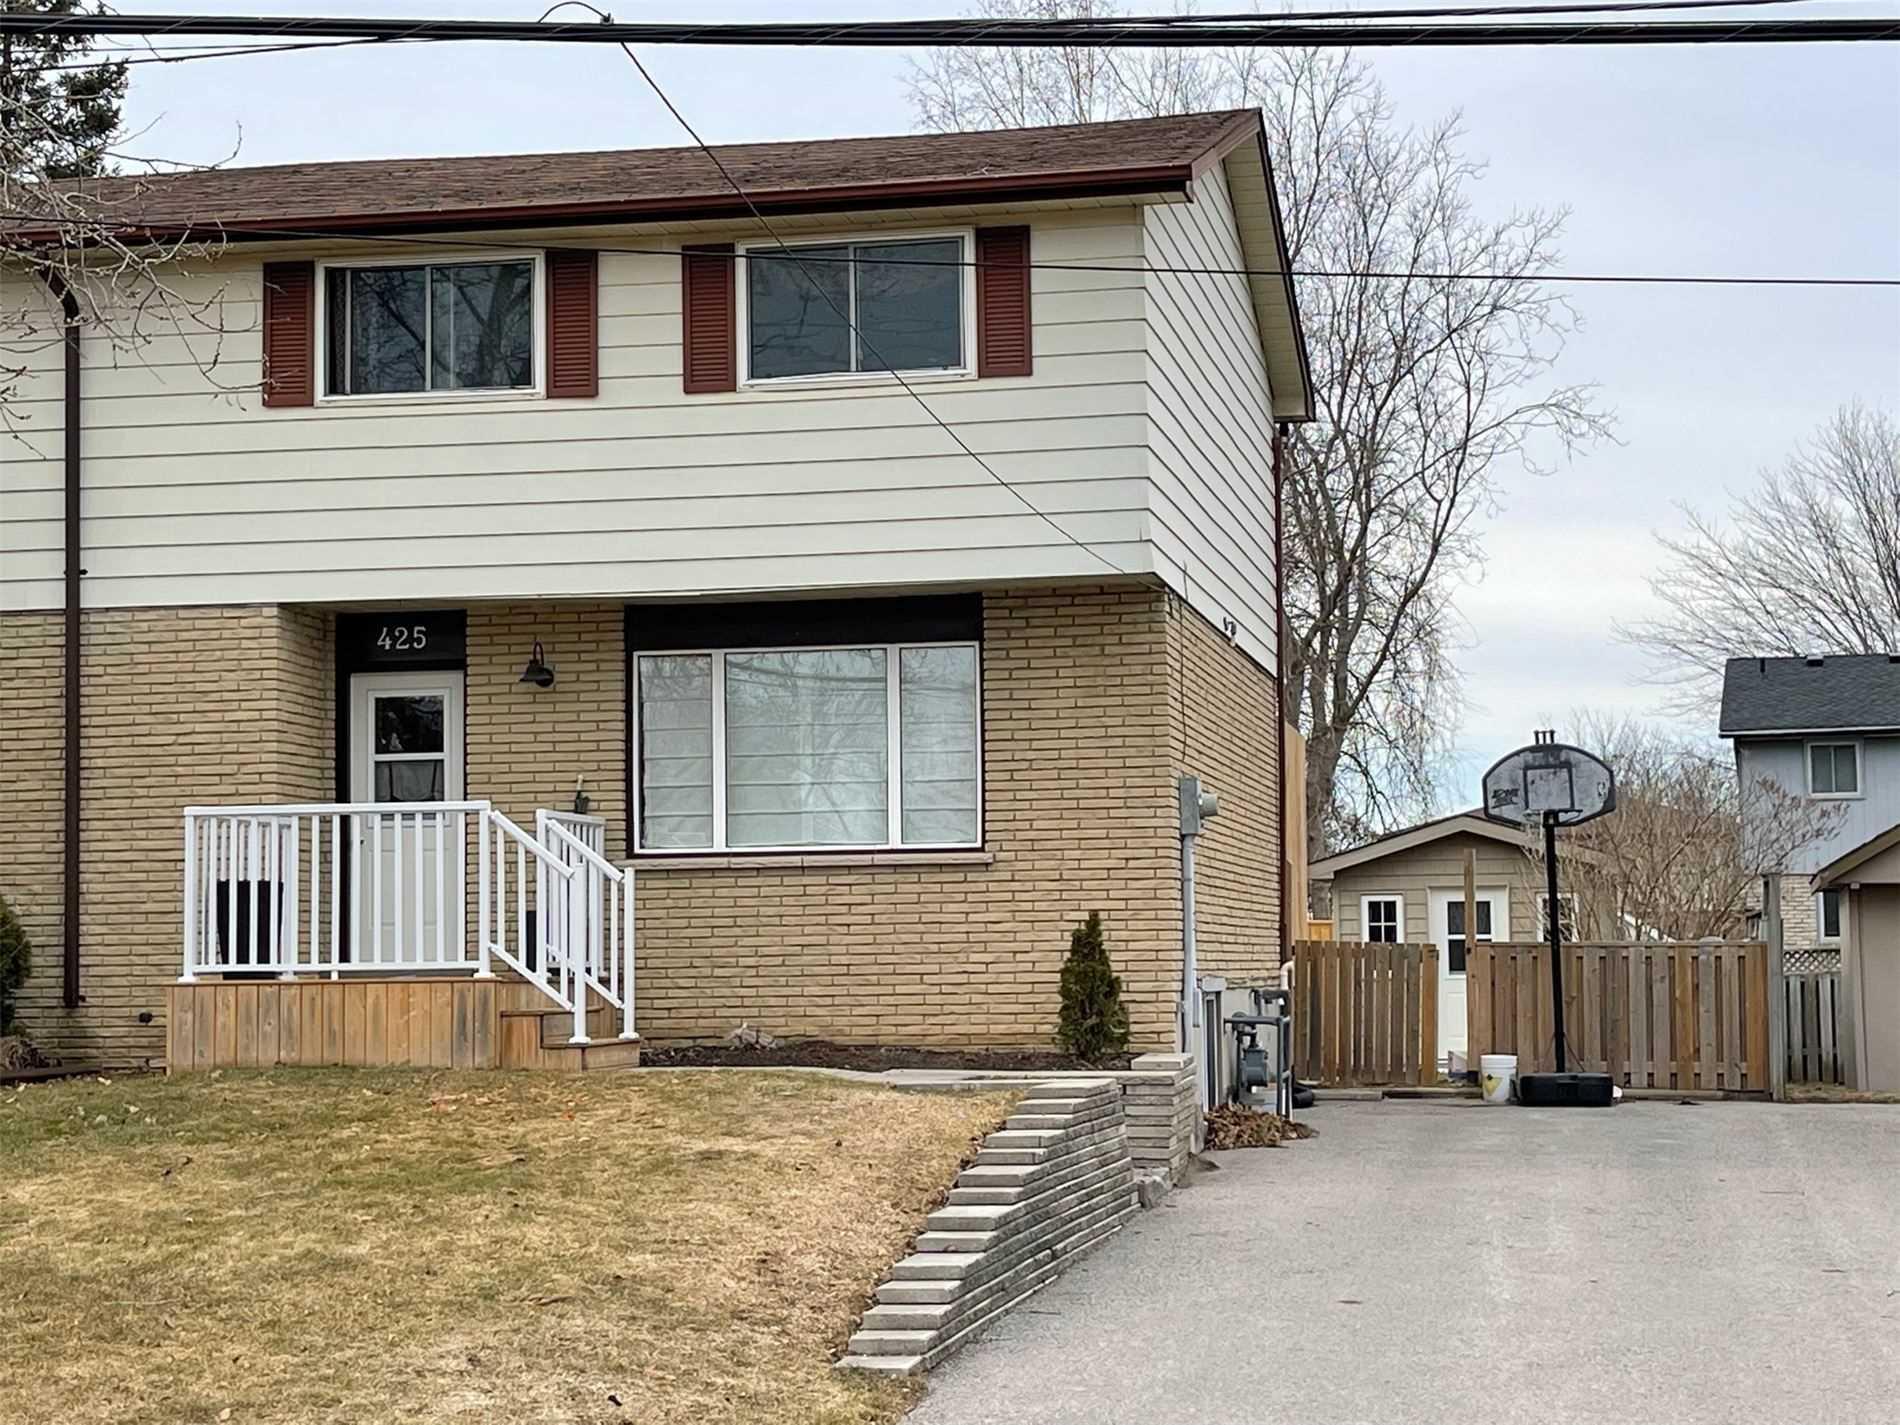 425 Bay St, Scugog, Ontario L9L1M7, 3 Bedrooms Bedrooms, ,2 BathroomsBathrooms,Semi-detached,For Sale,Bay,E5164765